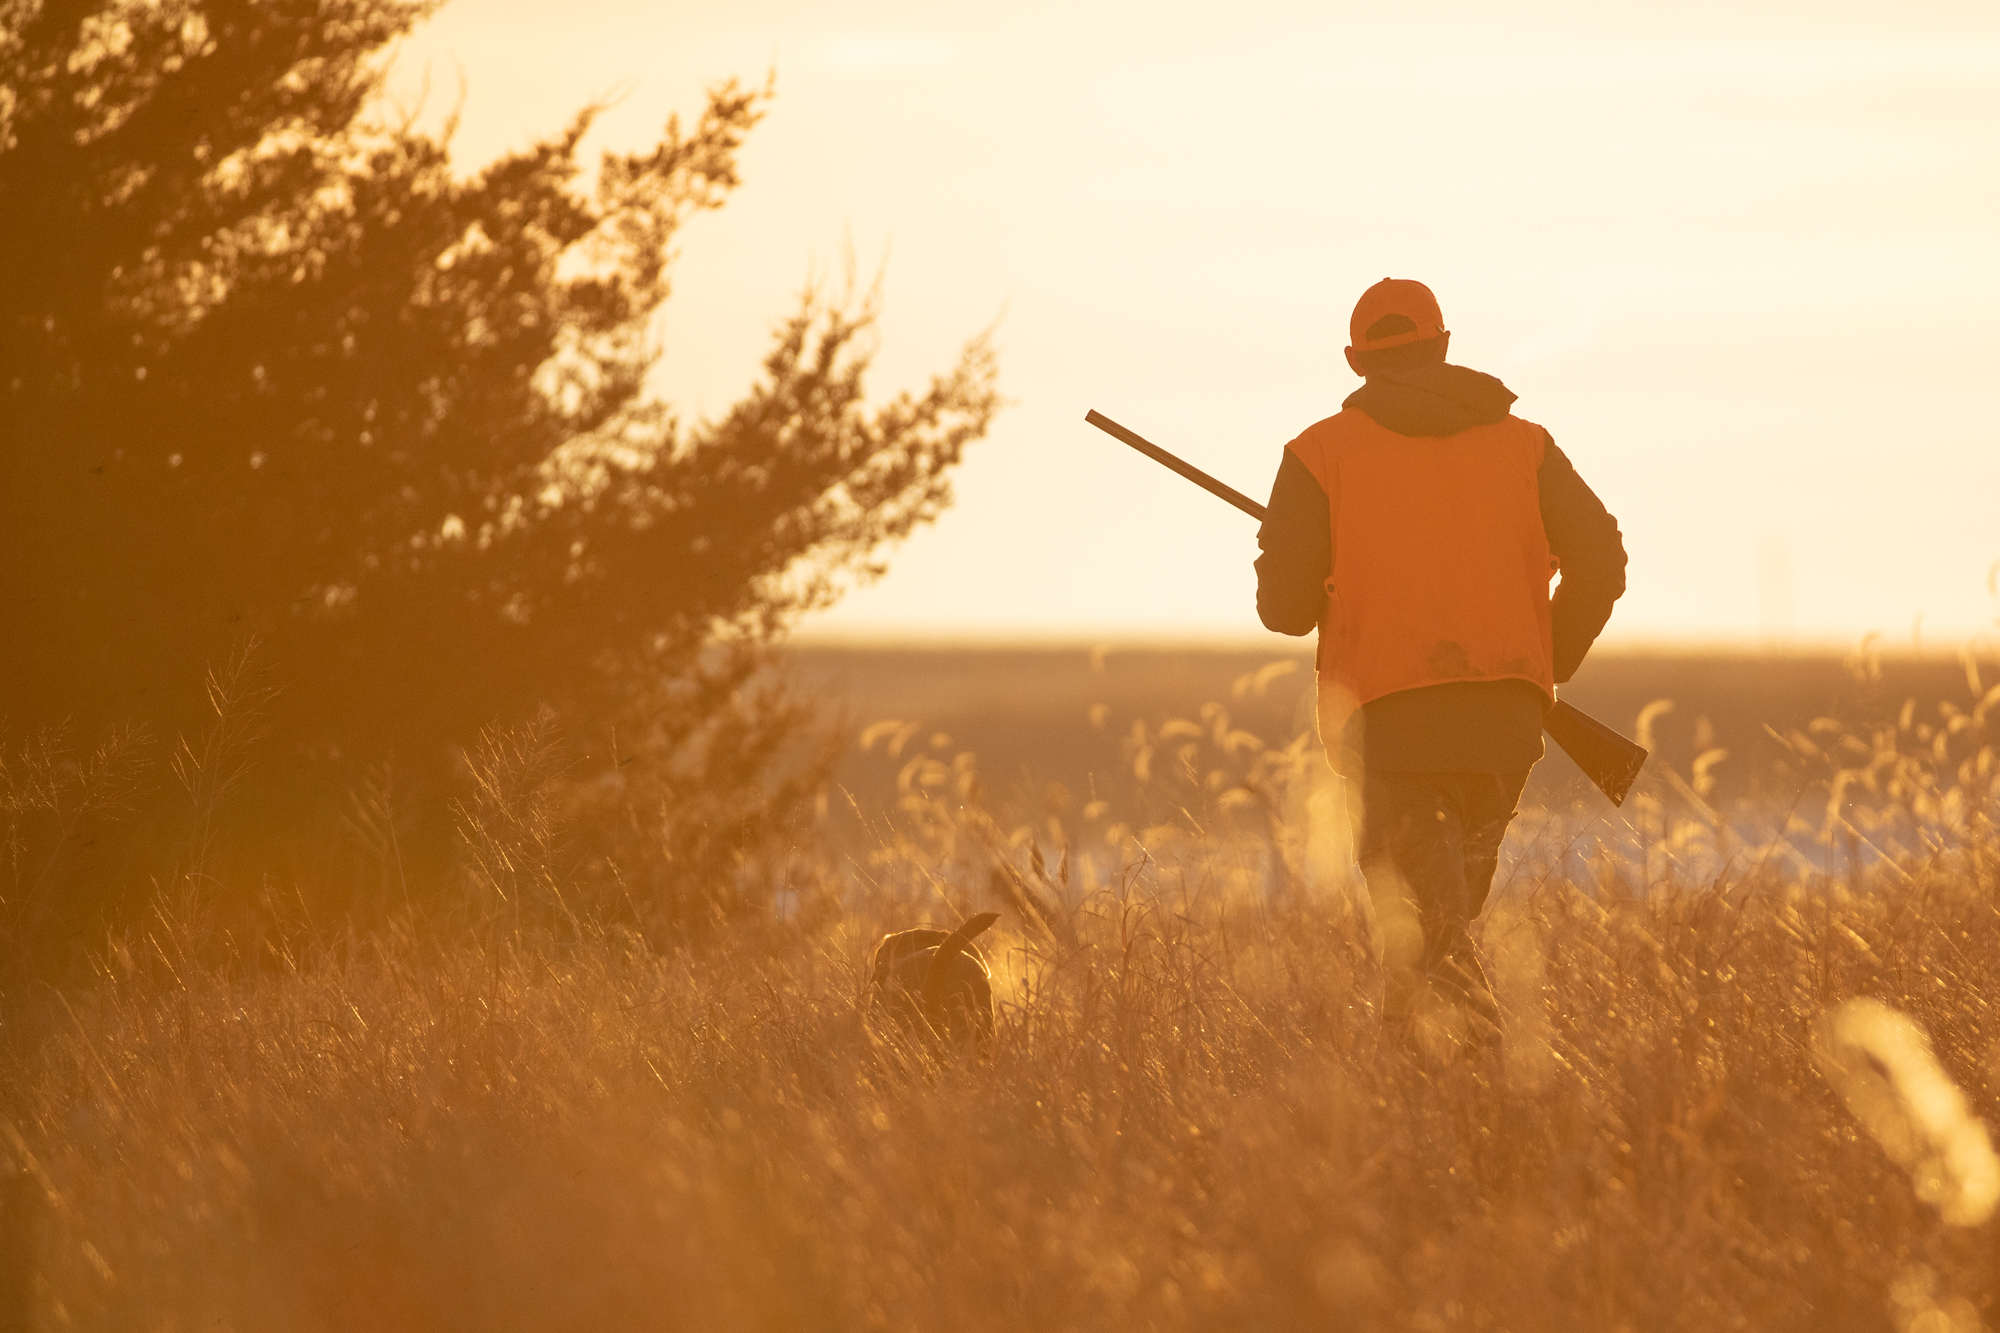 sunrise_rifle_hunting_bird_dog.jpg